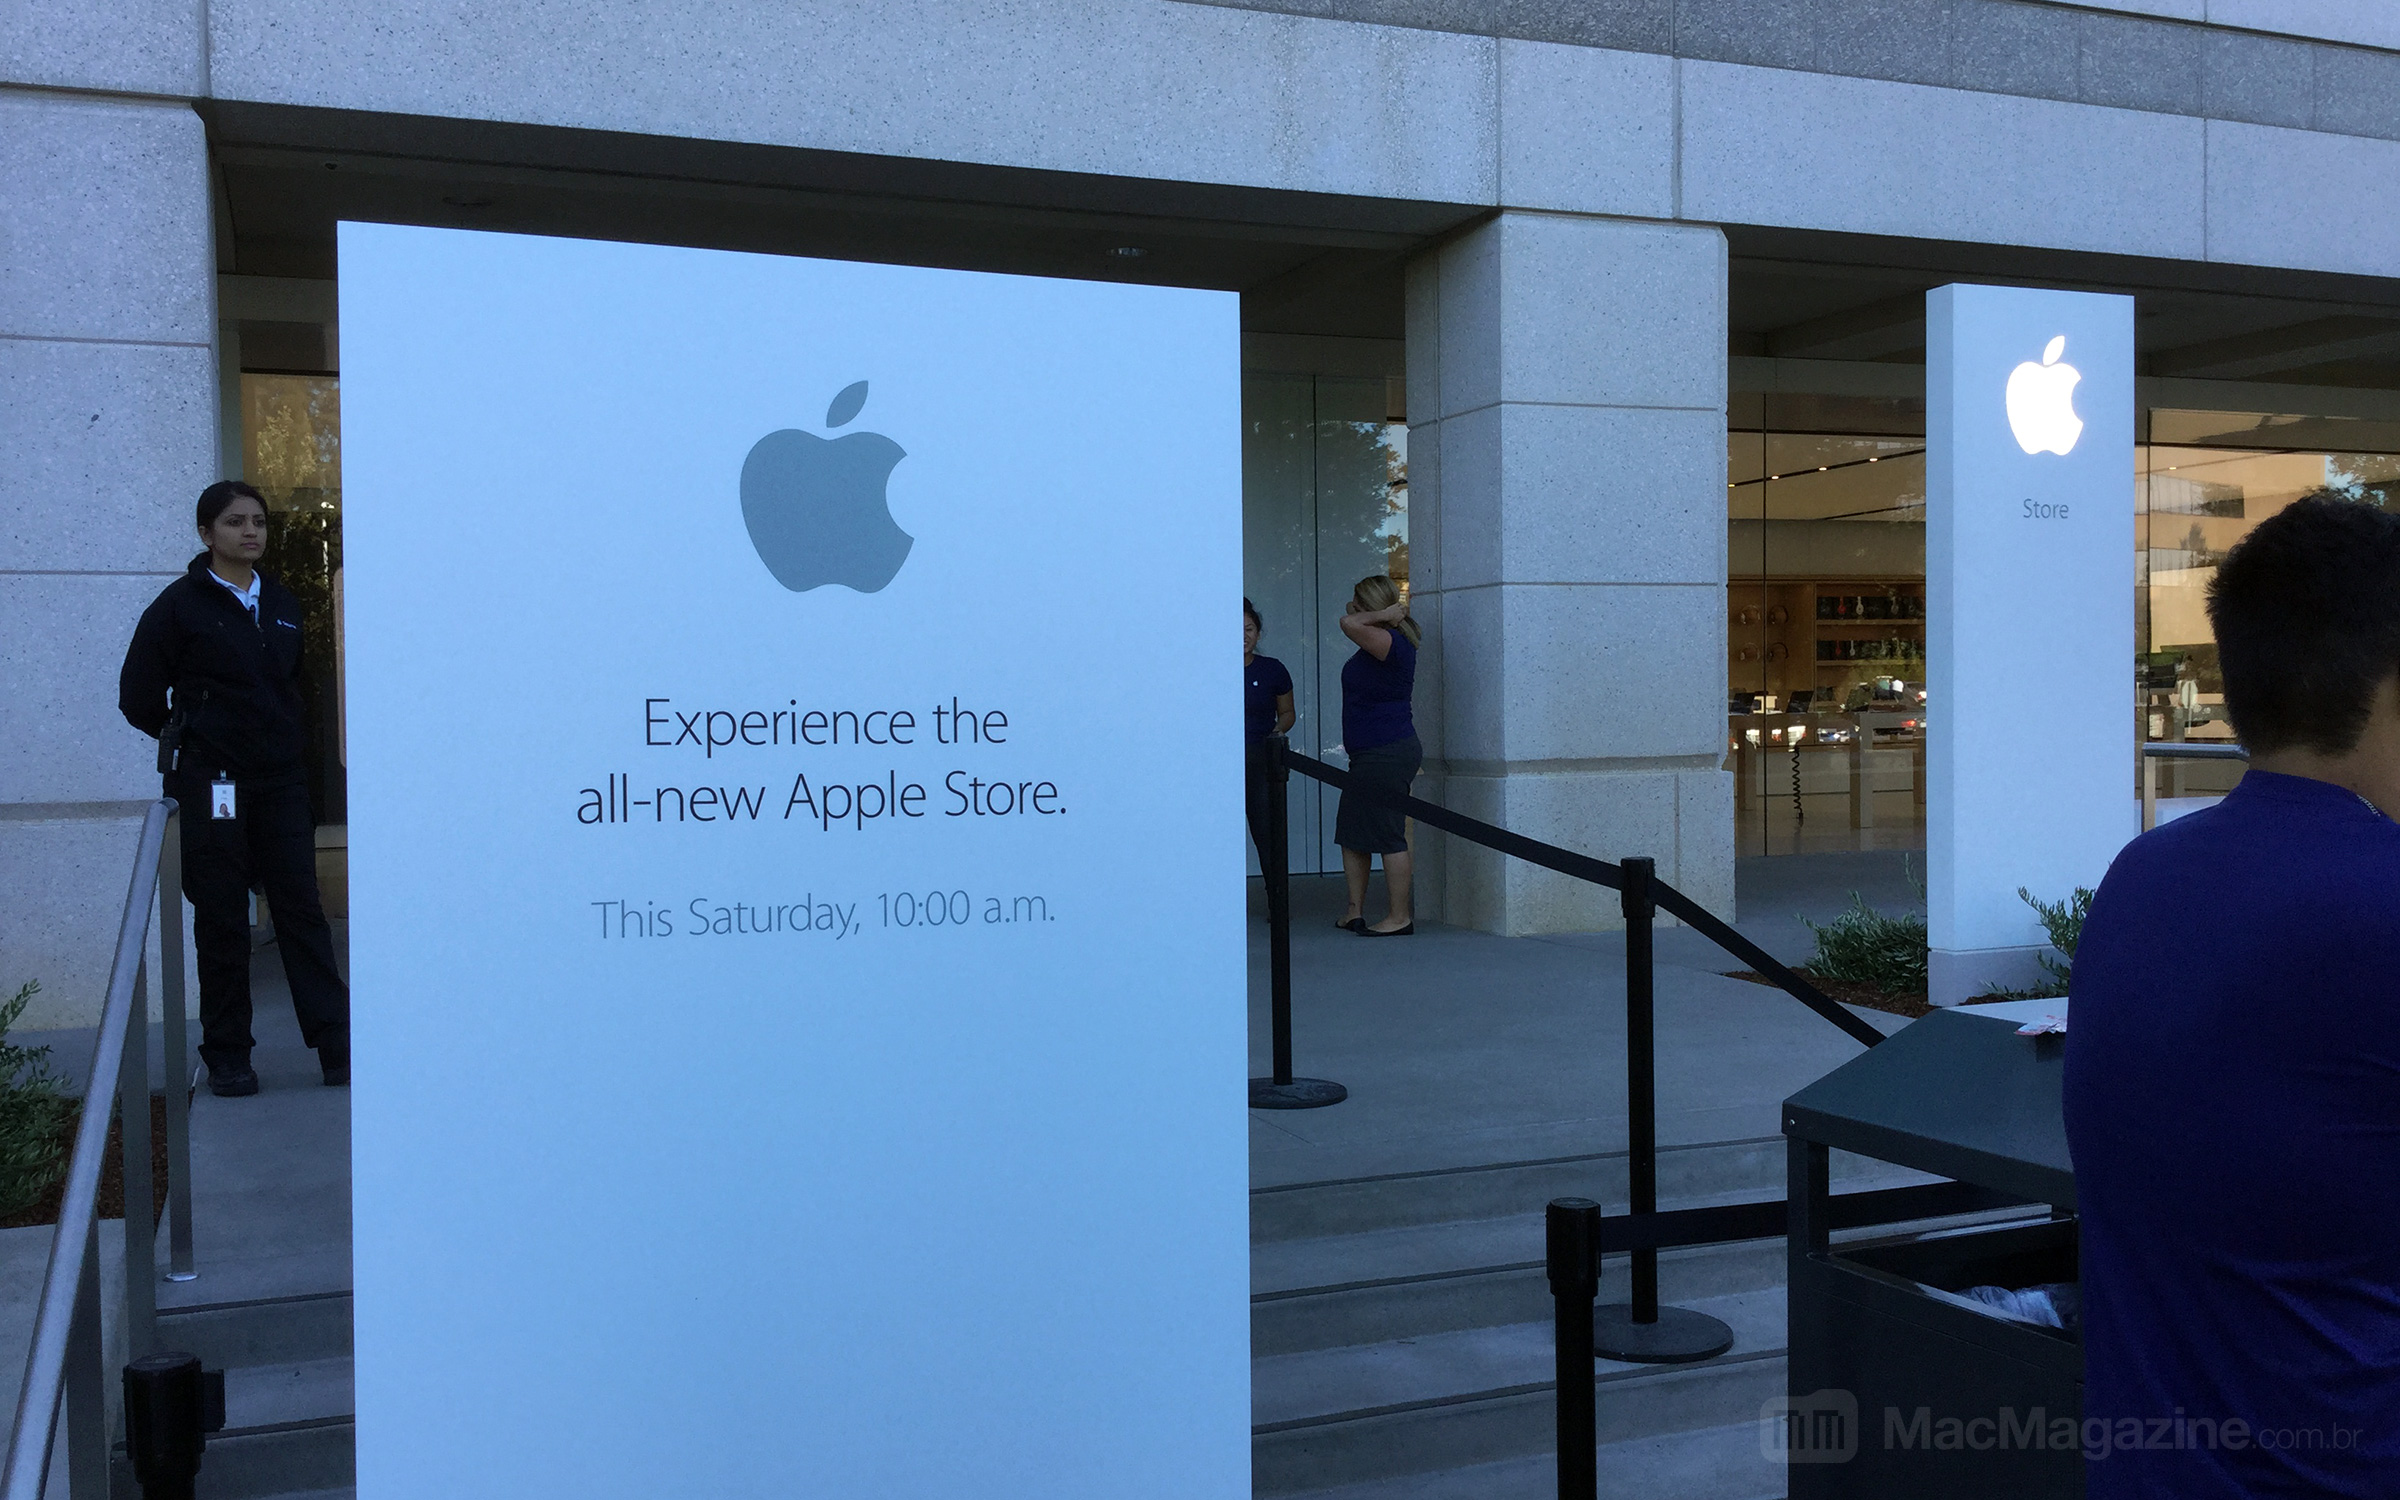 Inauguração da Apple Retail Store - Infinite Loop em Cupertino